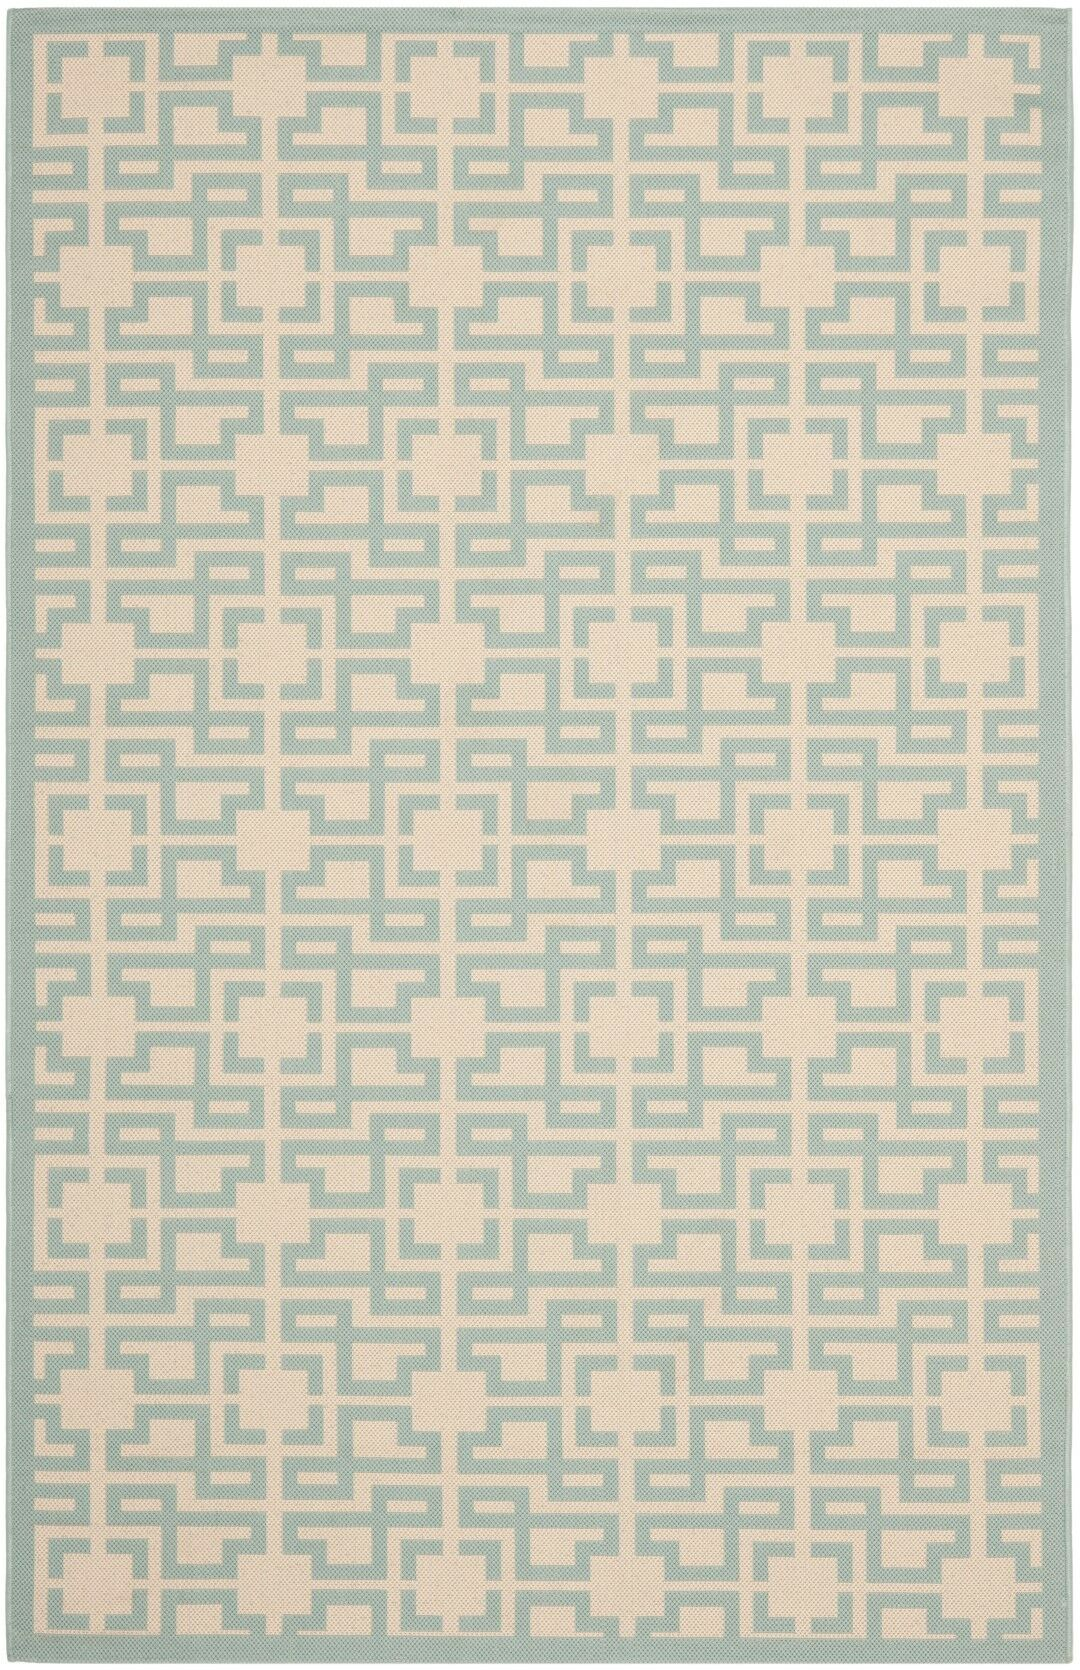 Martha Stewart Teal Area Rug Rug Size: Rectangle 4' x 5'7